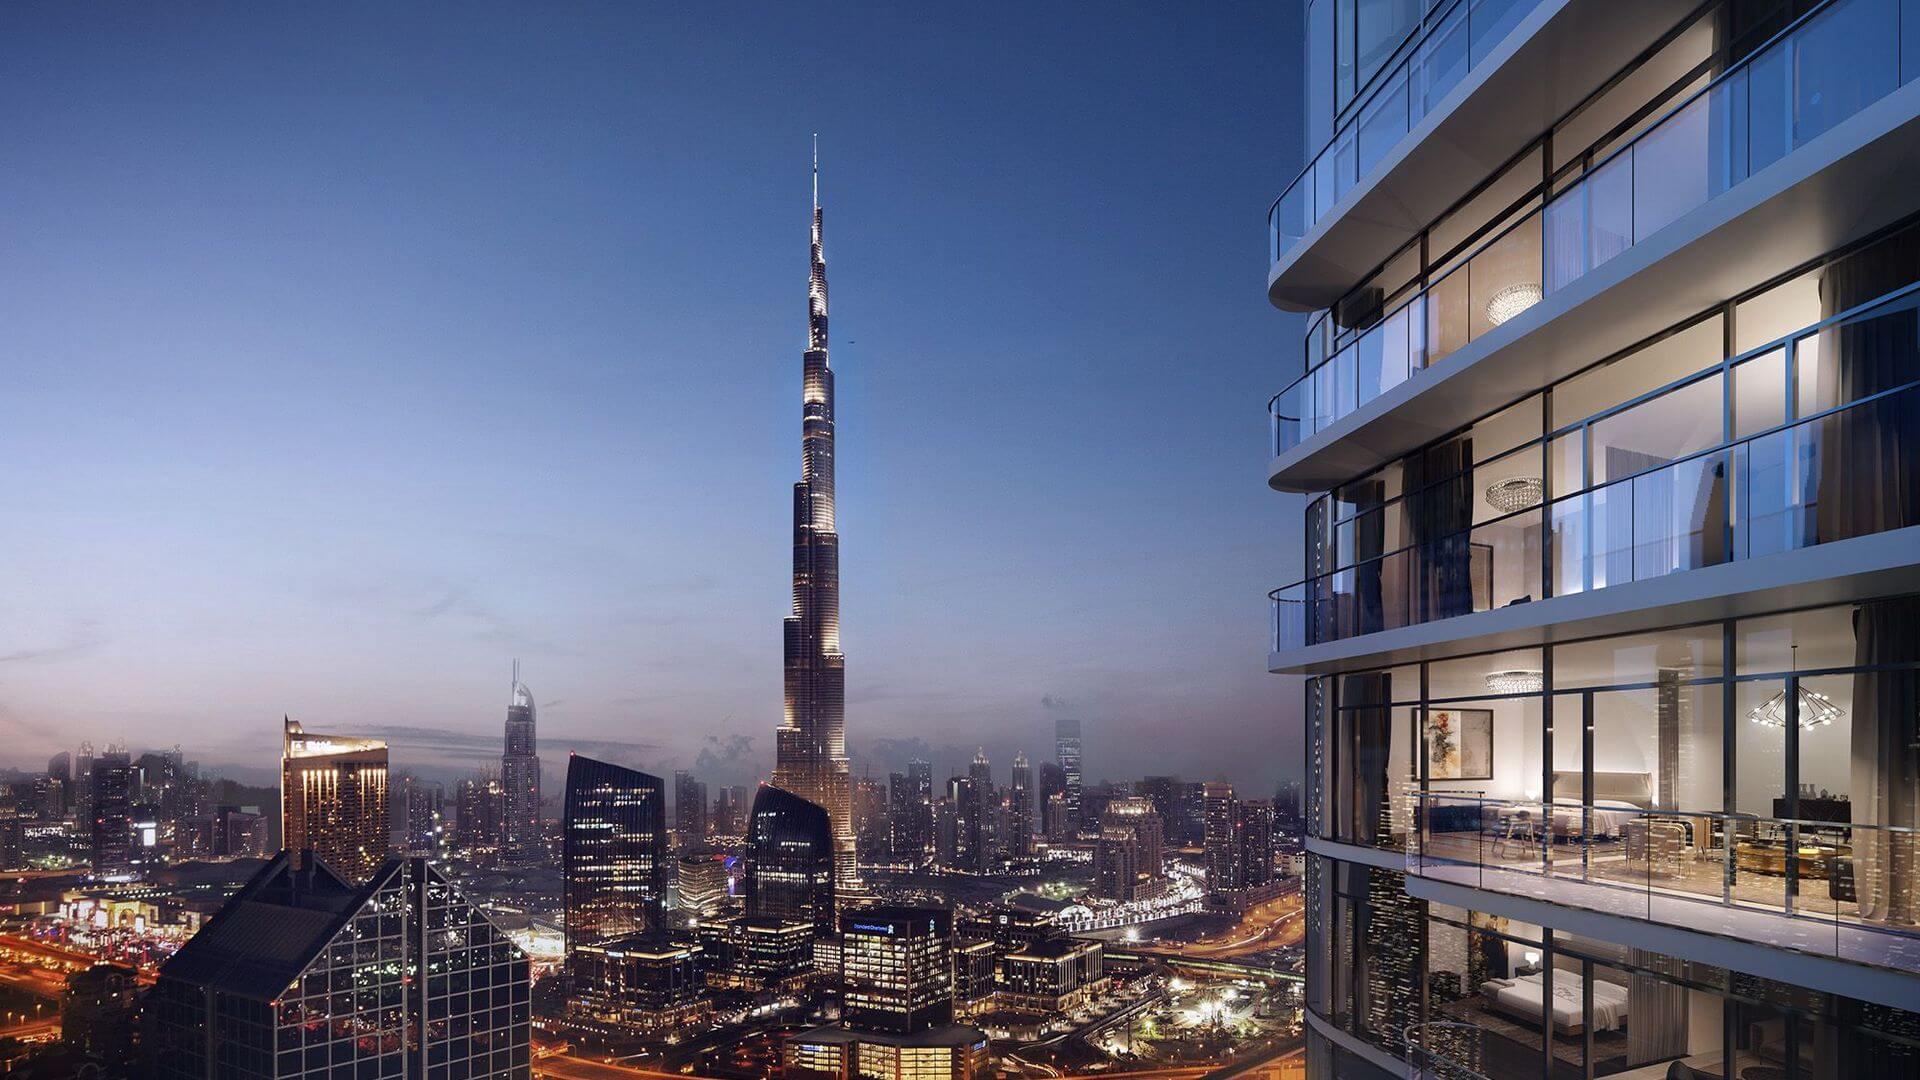 PARAMOUNT TOWER HOTEL & RESIDENCES, Business Bay, Dubai, UAE – photo 3